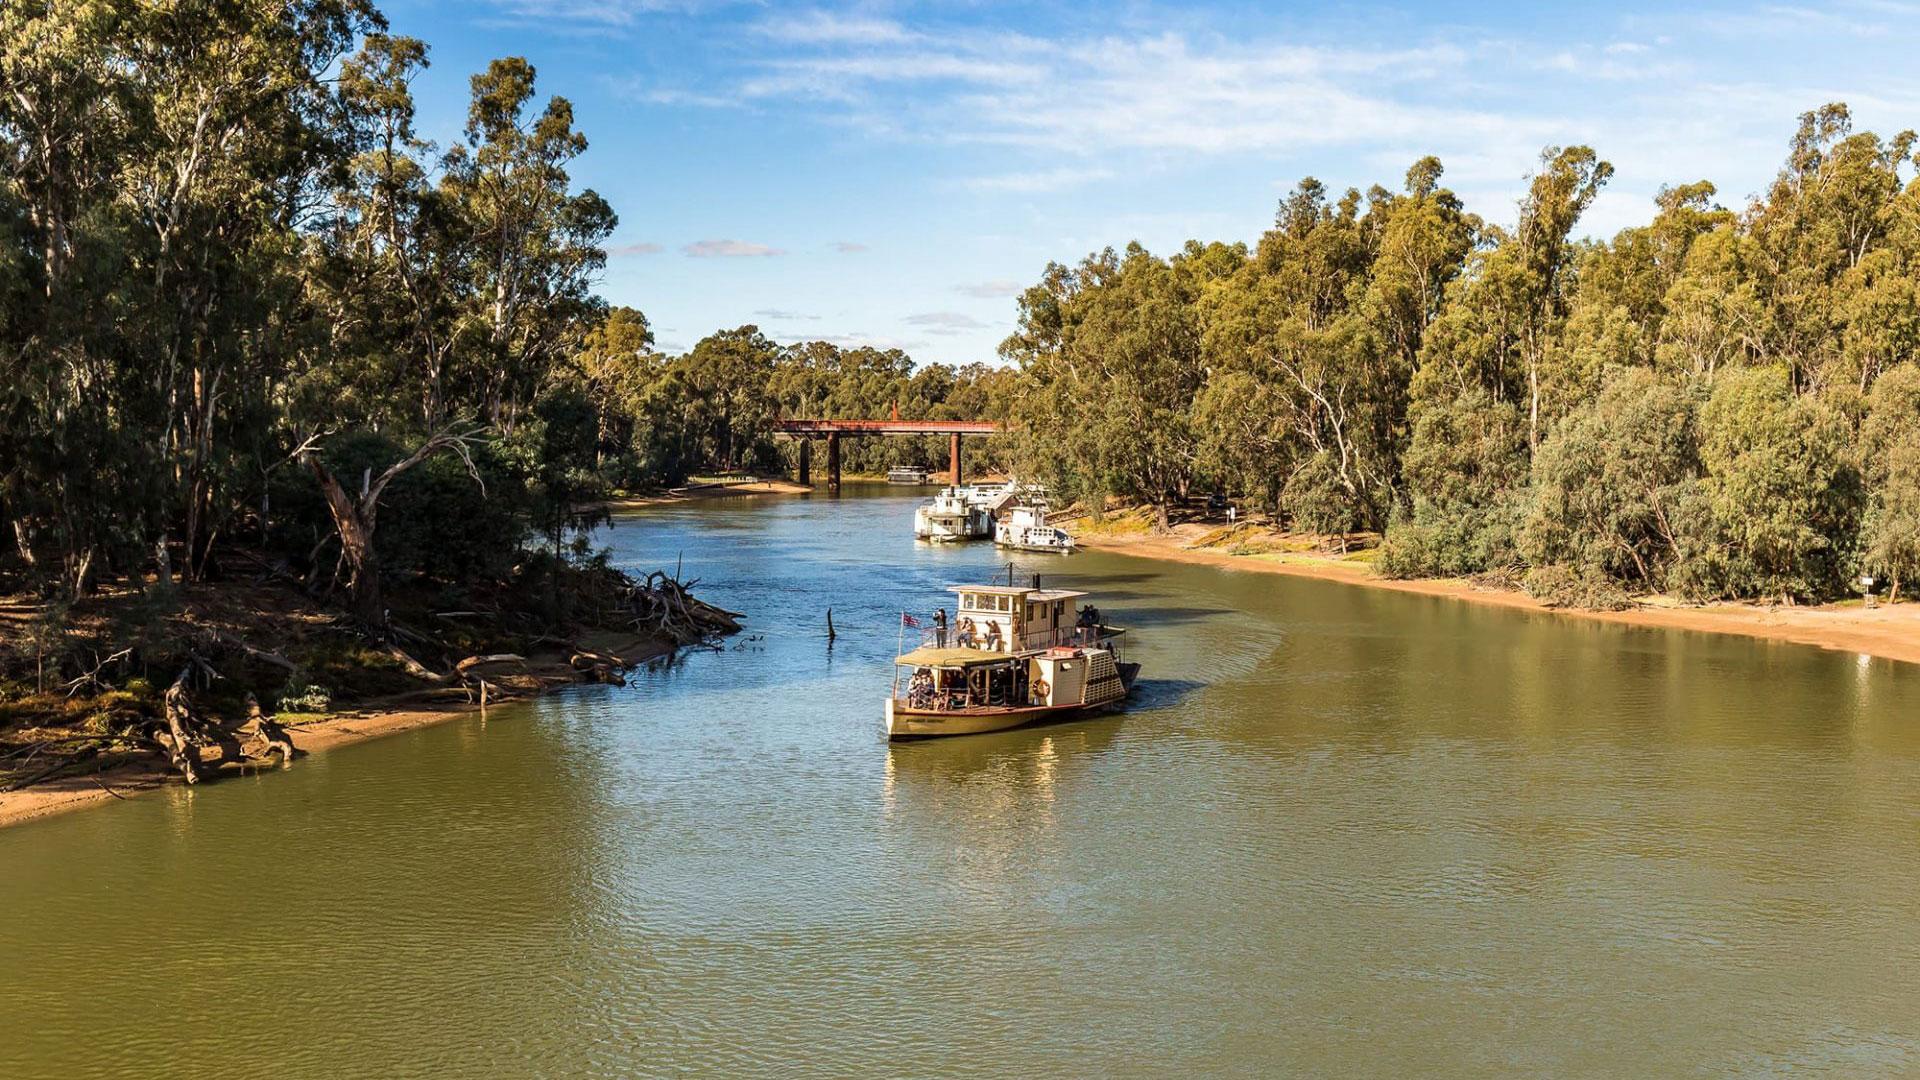 Moama Bridge Paddle Steamers